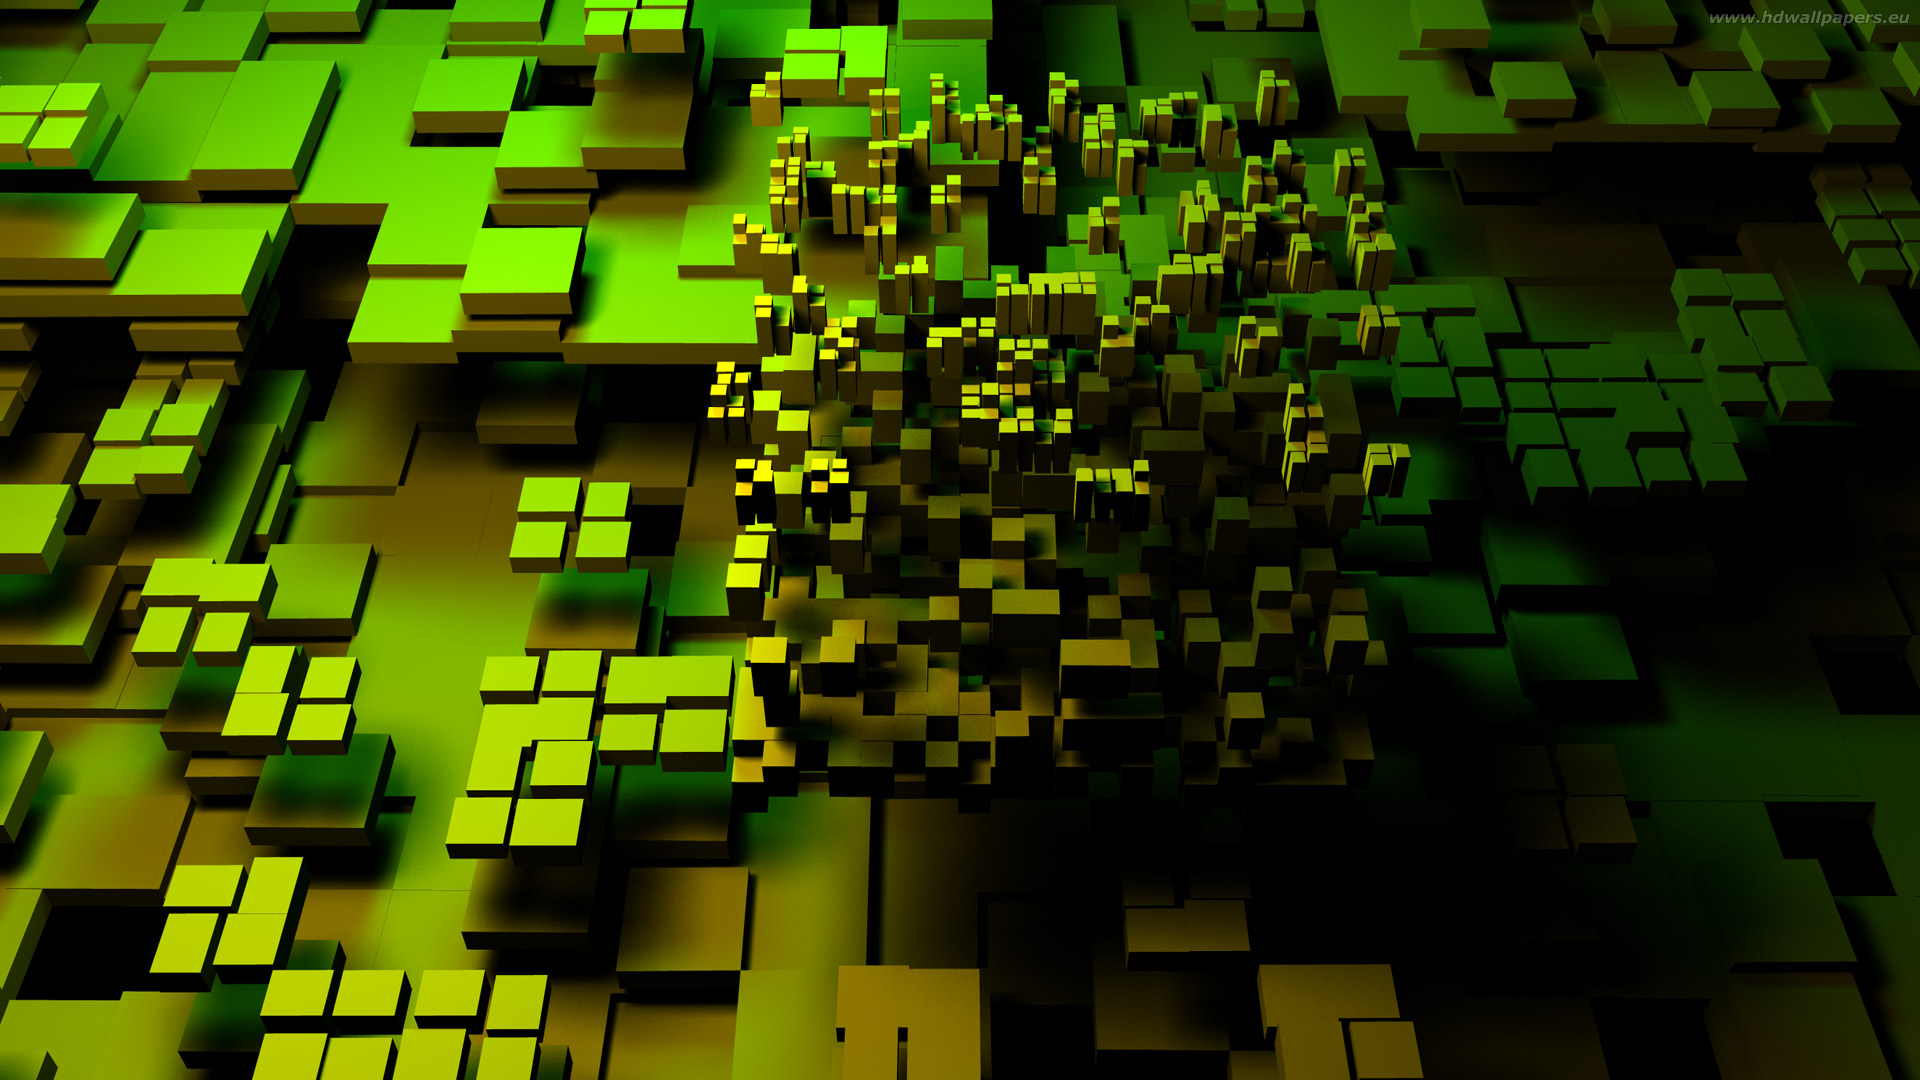 Free Full Screen Fall Wallpaper 1920x1080 Hd Wallpapers Pixelstalk Net